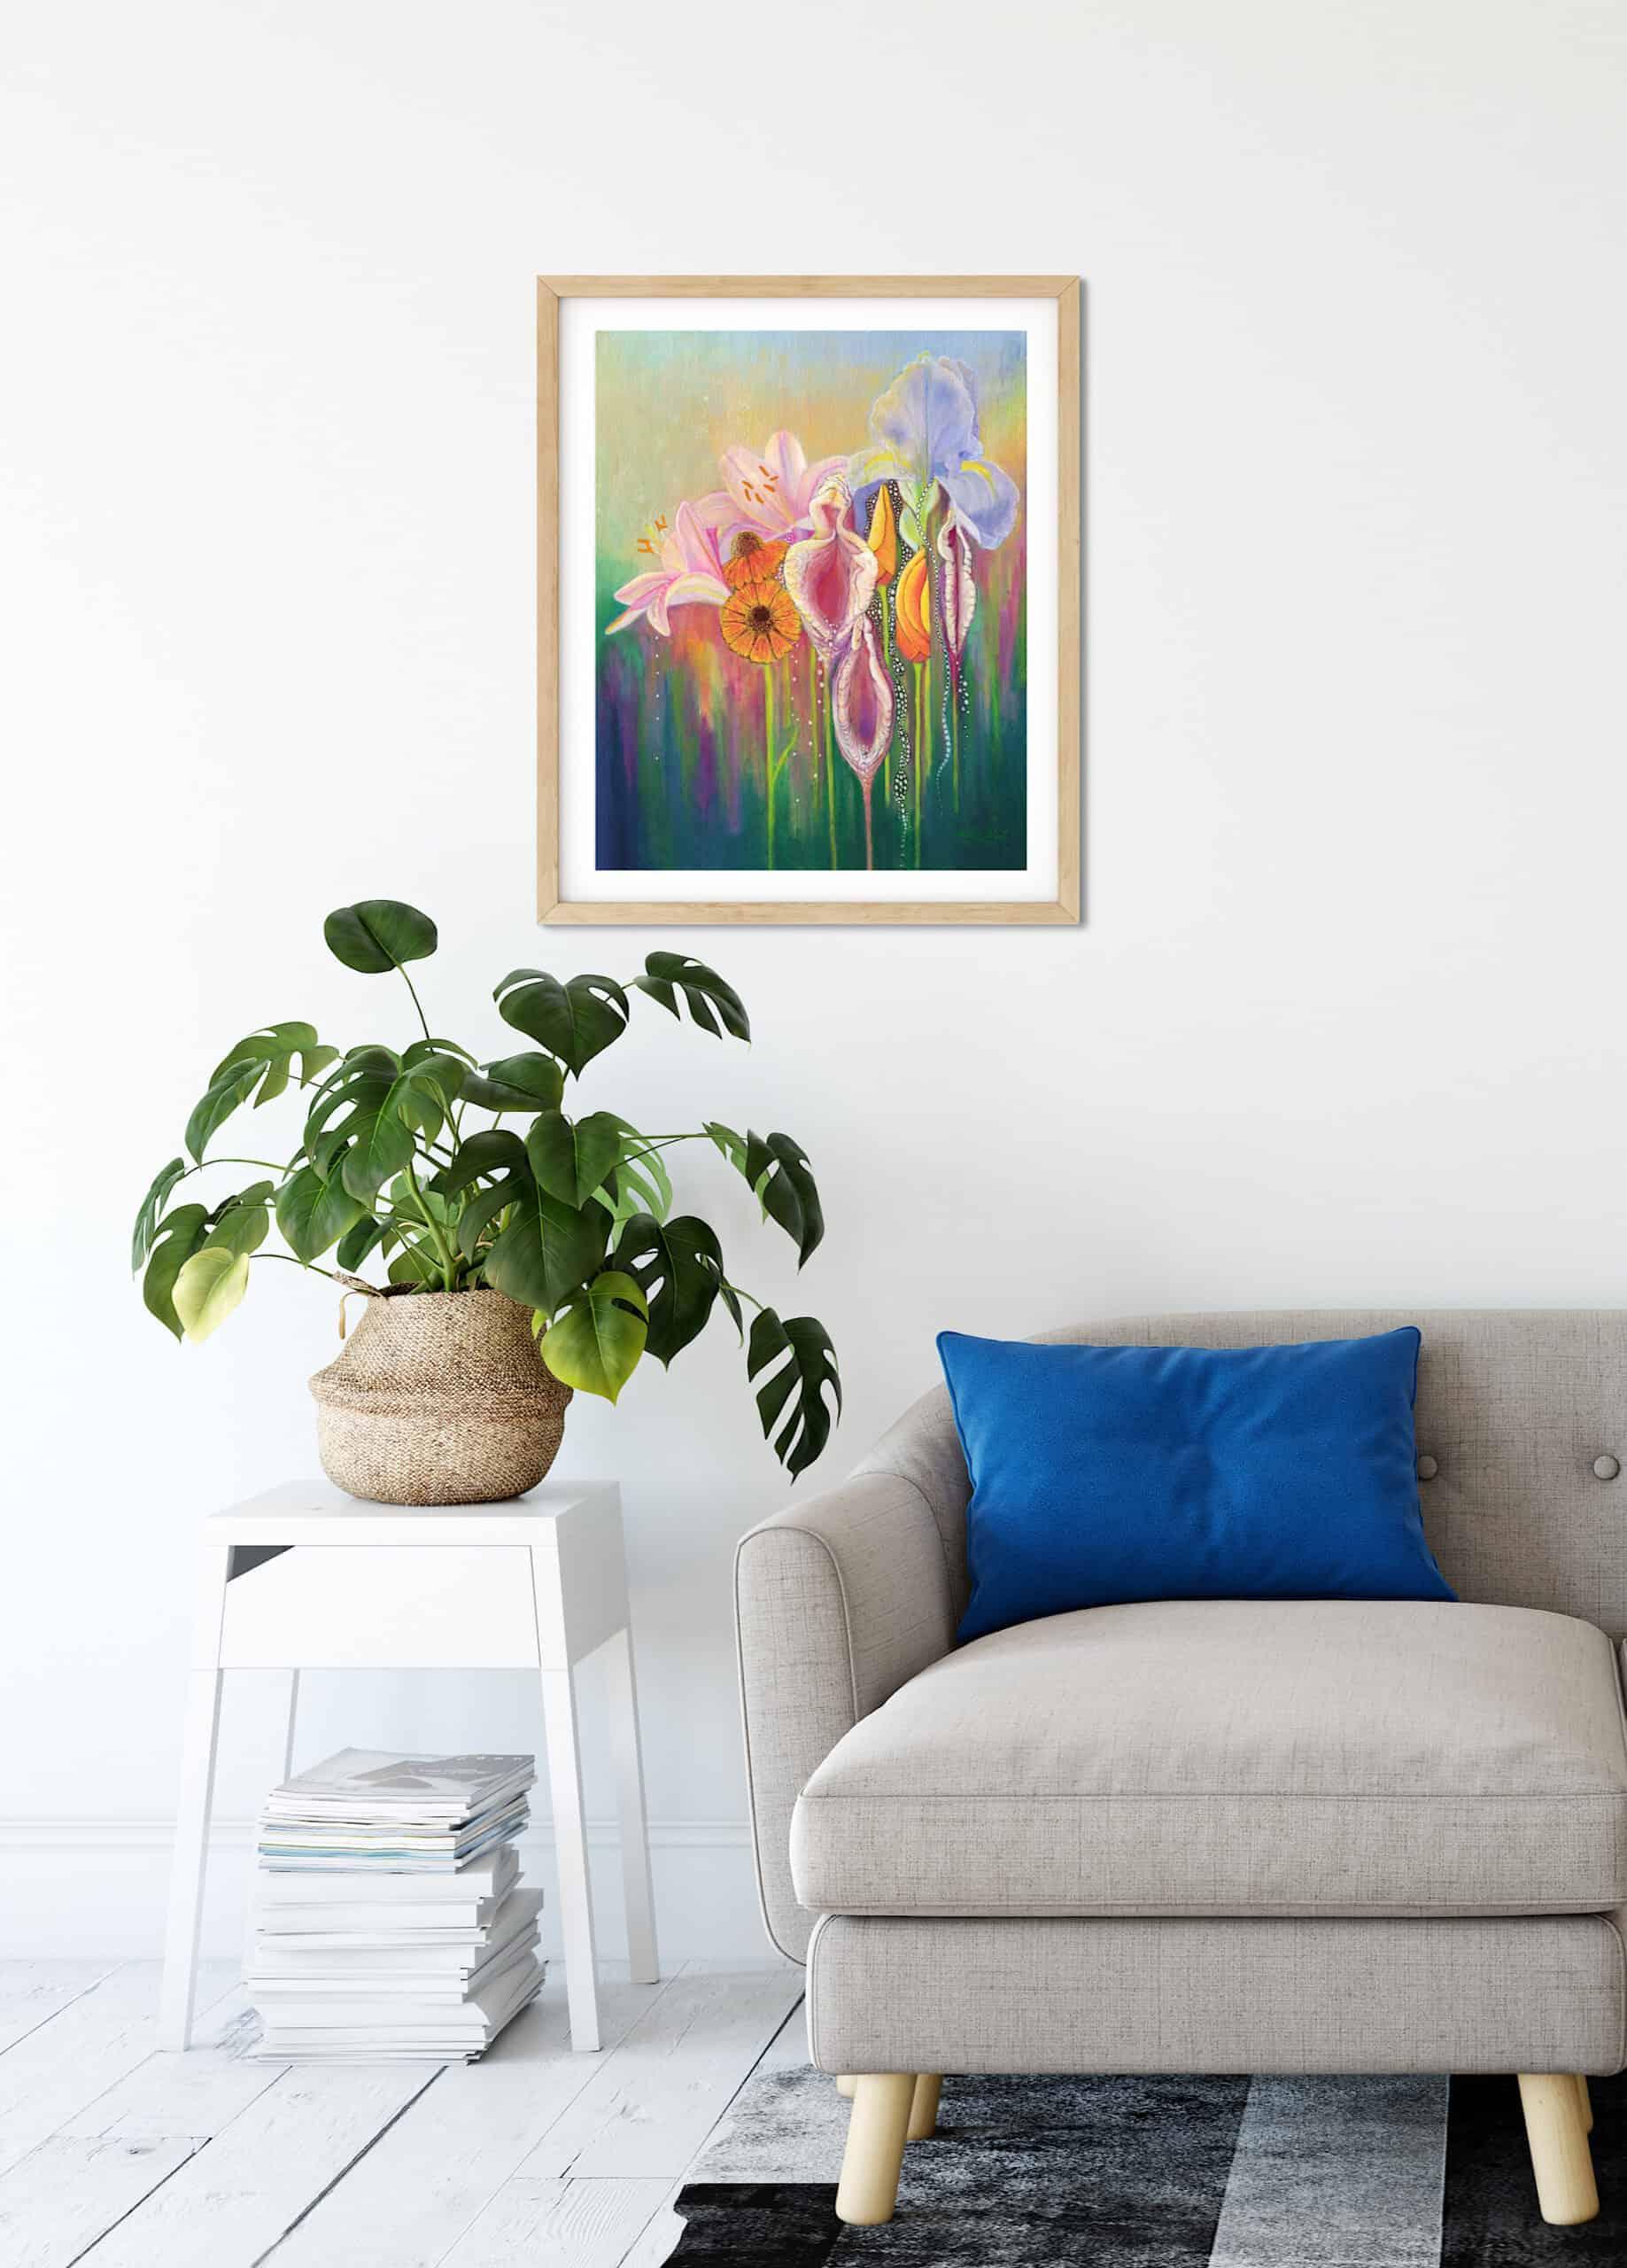 Yoni Nectar hanging on lounge room wall